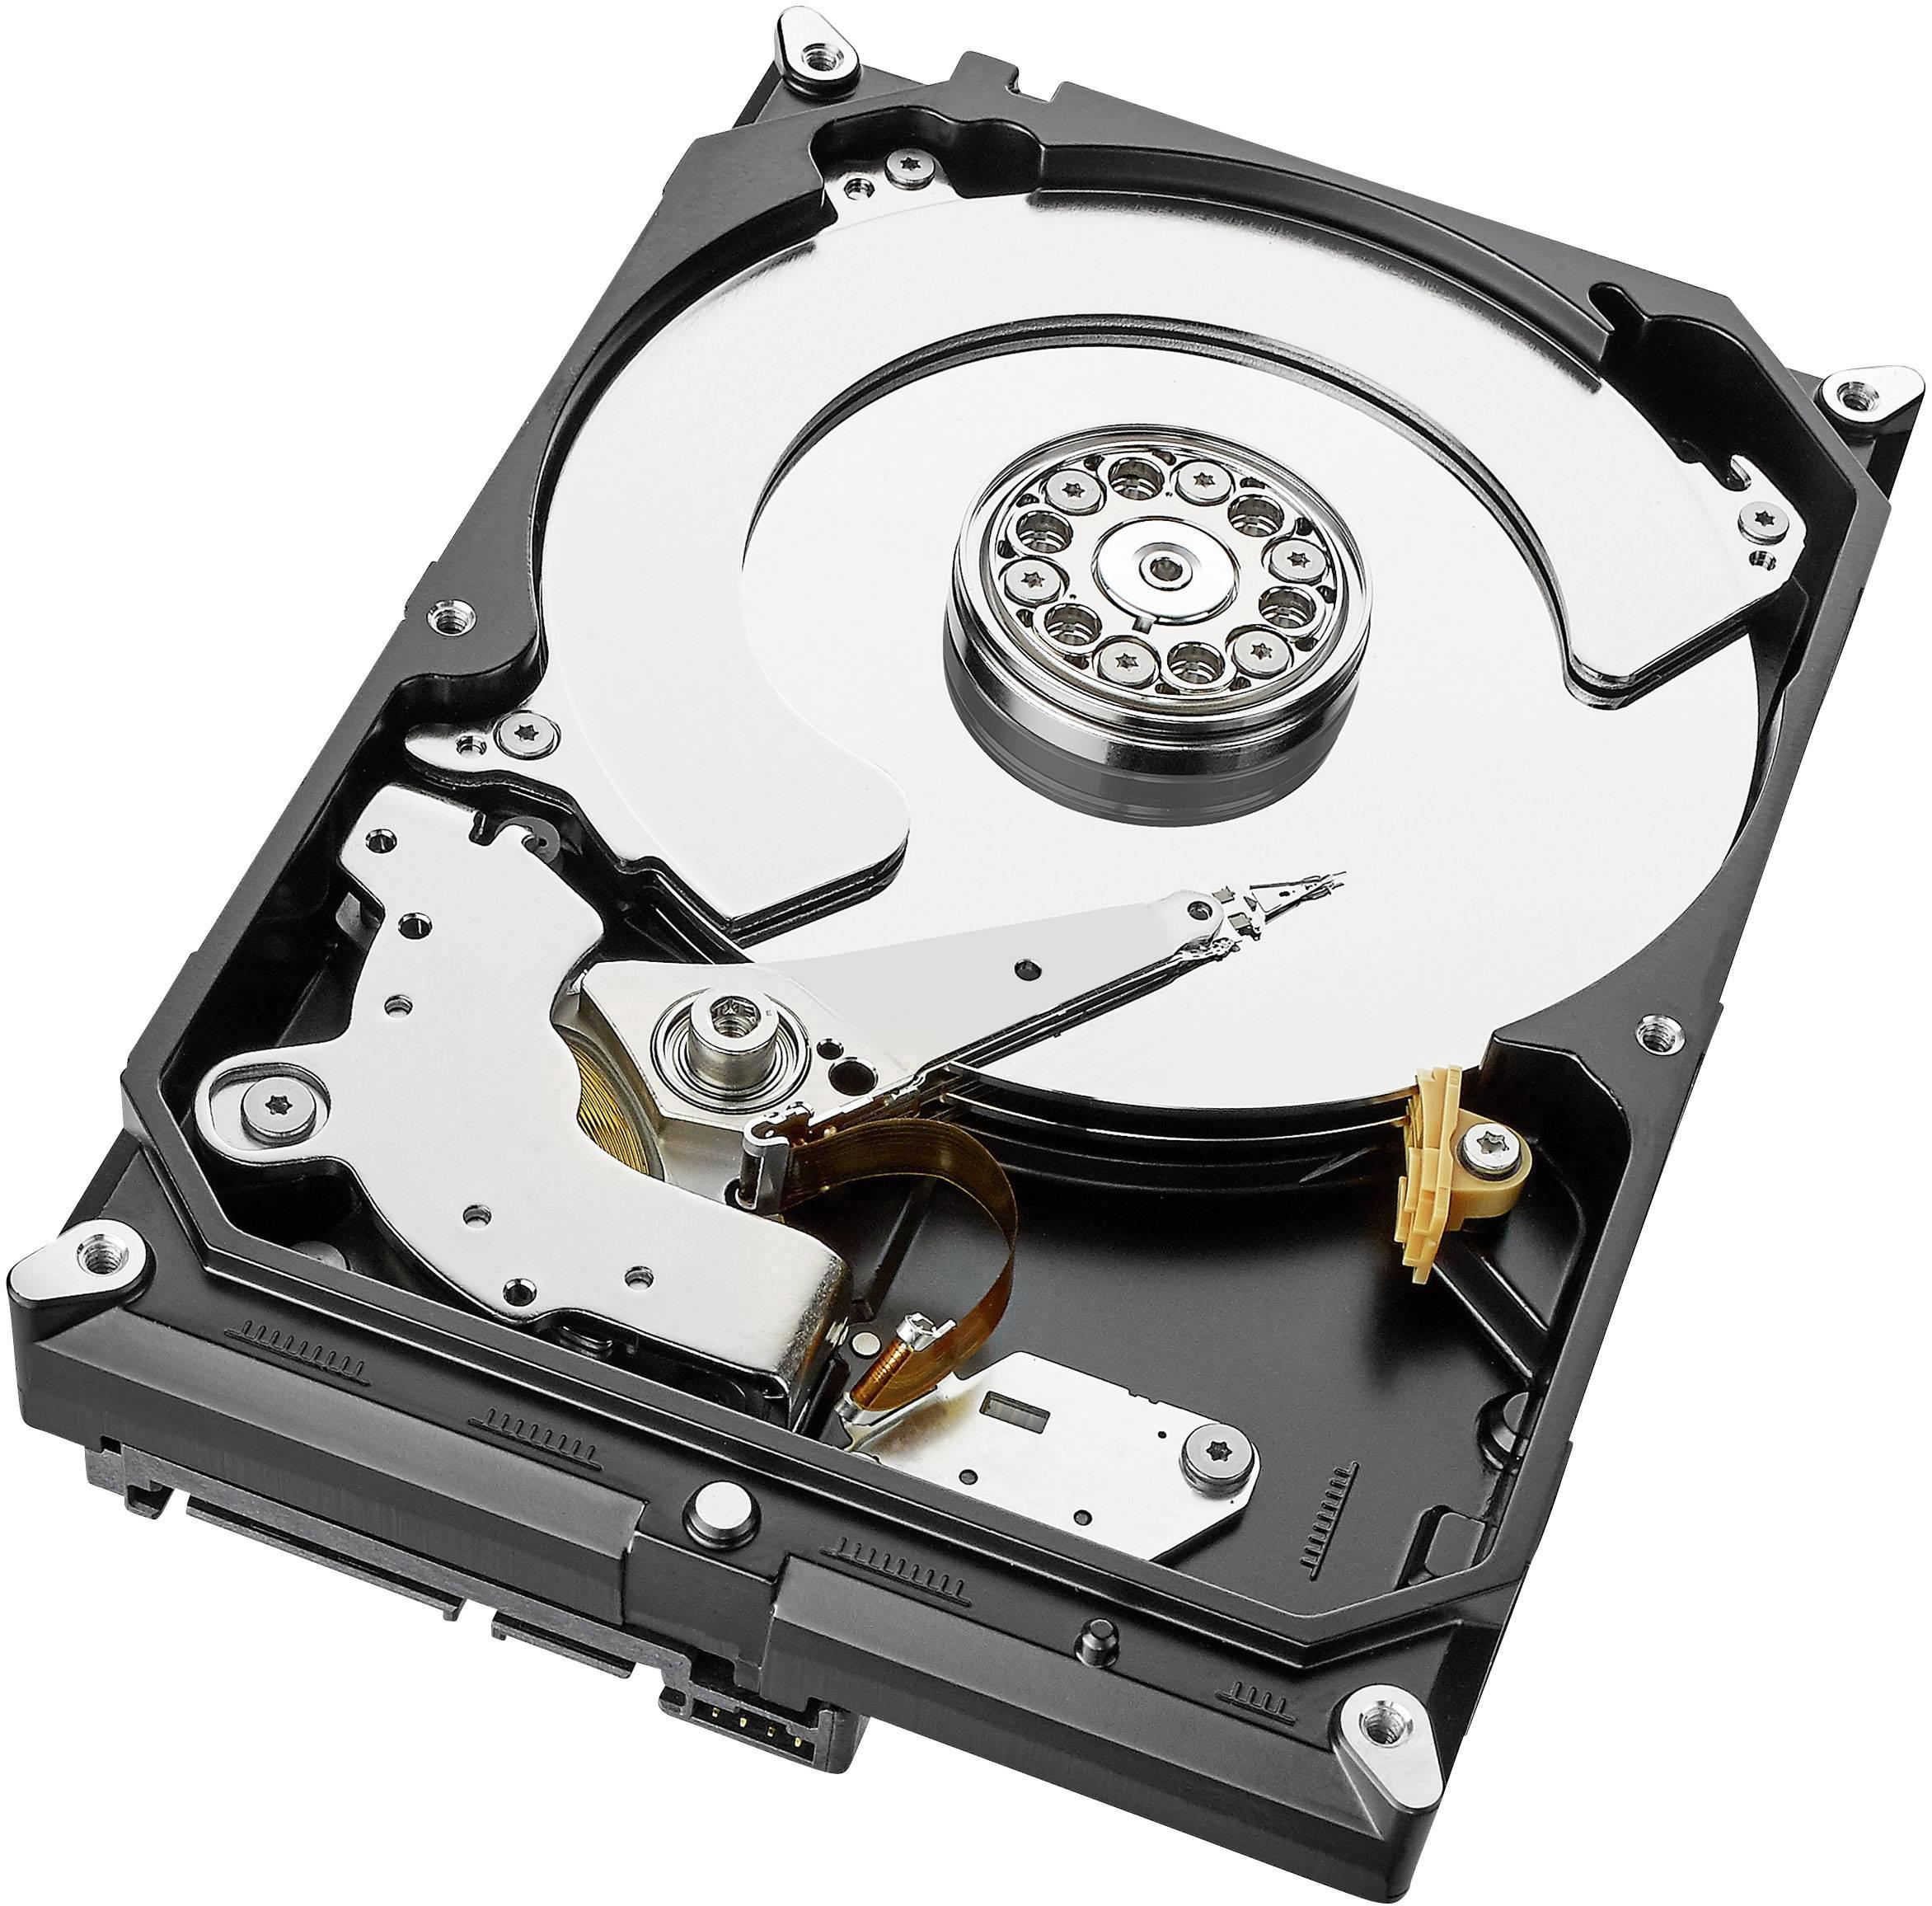 "Recertifikovaný interní pevný disk 8,9 cm (3,5"") 3 TB Hitachi Ultrastar 7K4000 Bulk HUS724030ALS640-FR SAS"